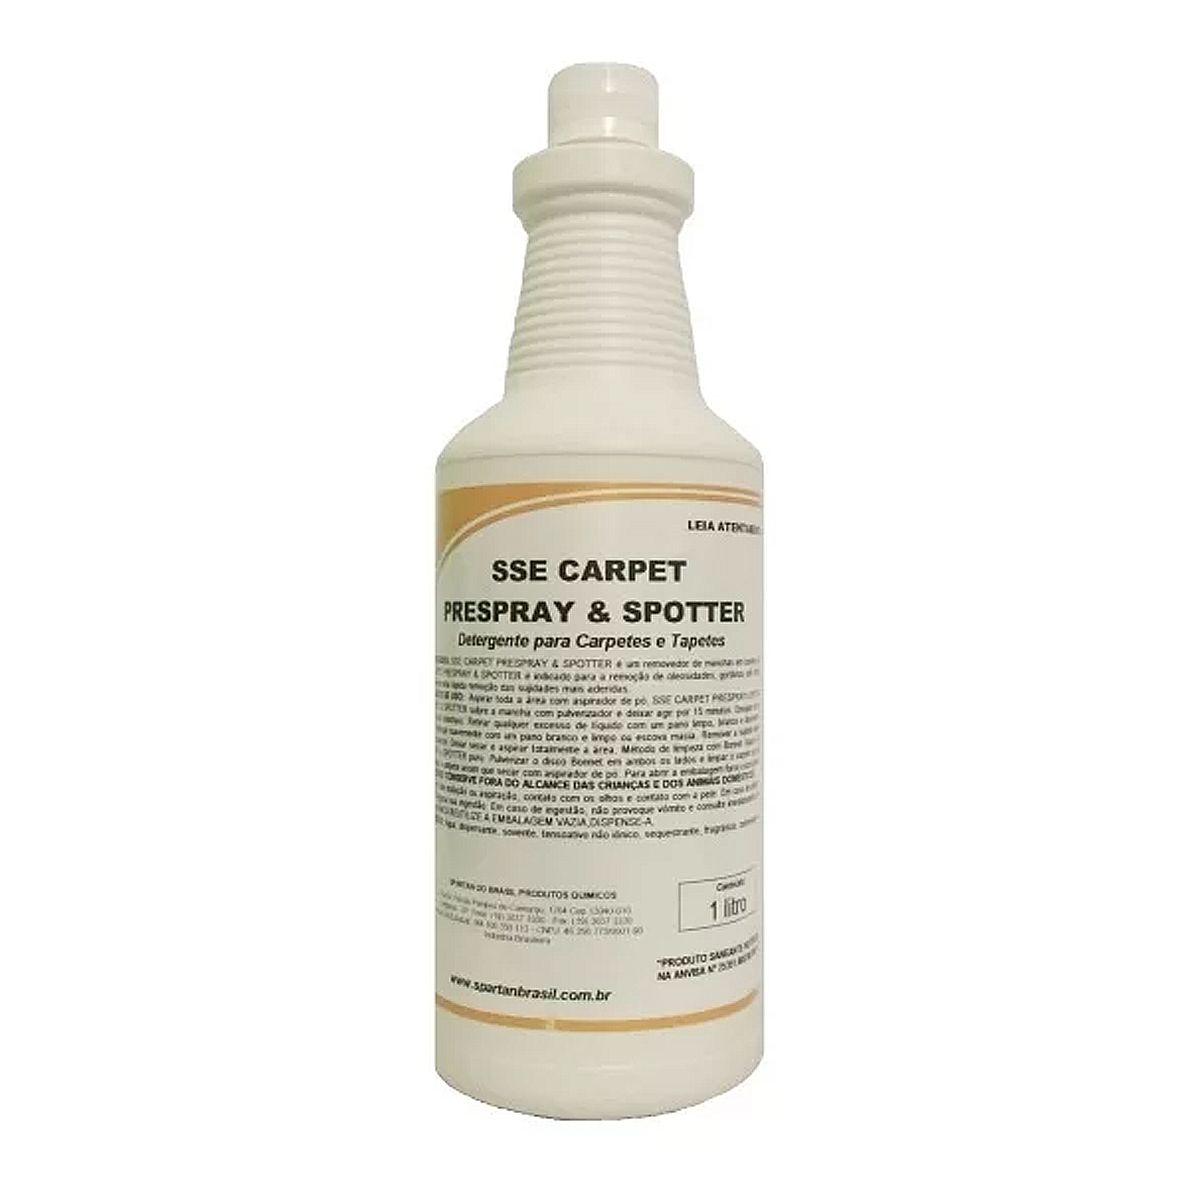 Removedor De Manchas Em Carpetes Sse Carpet Prespray & Spotter Spartan 1L